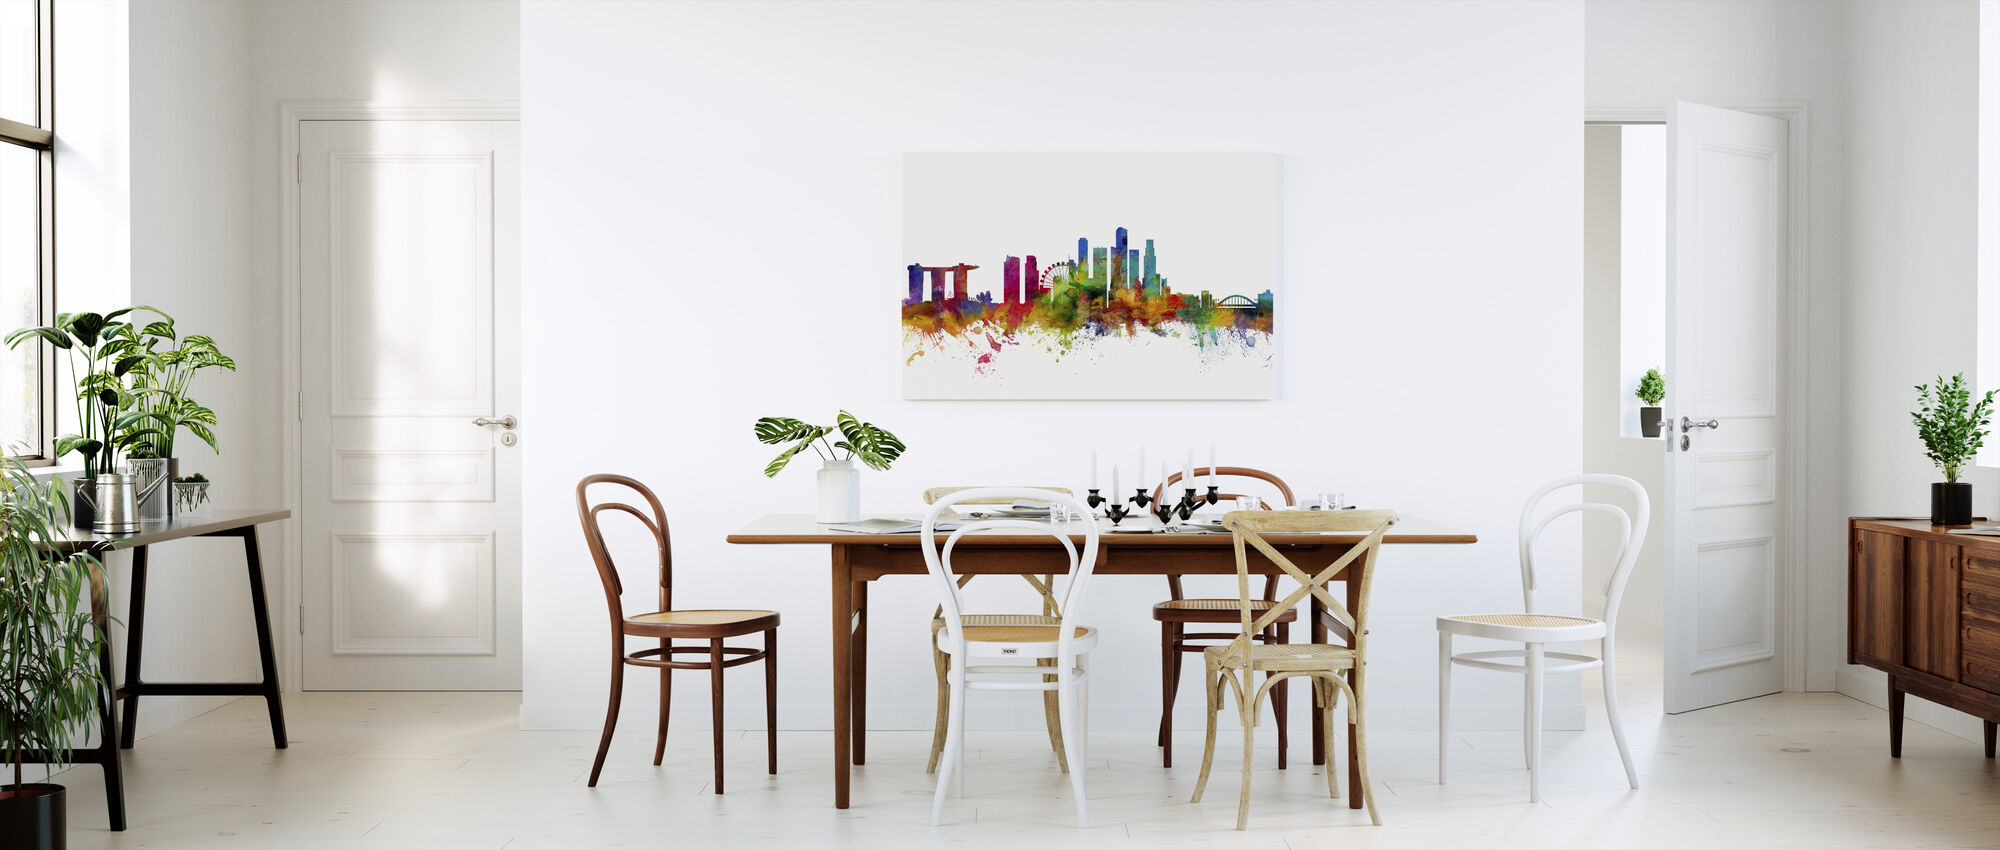 Singapore Skyline - Canvas print - Kitchen